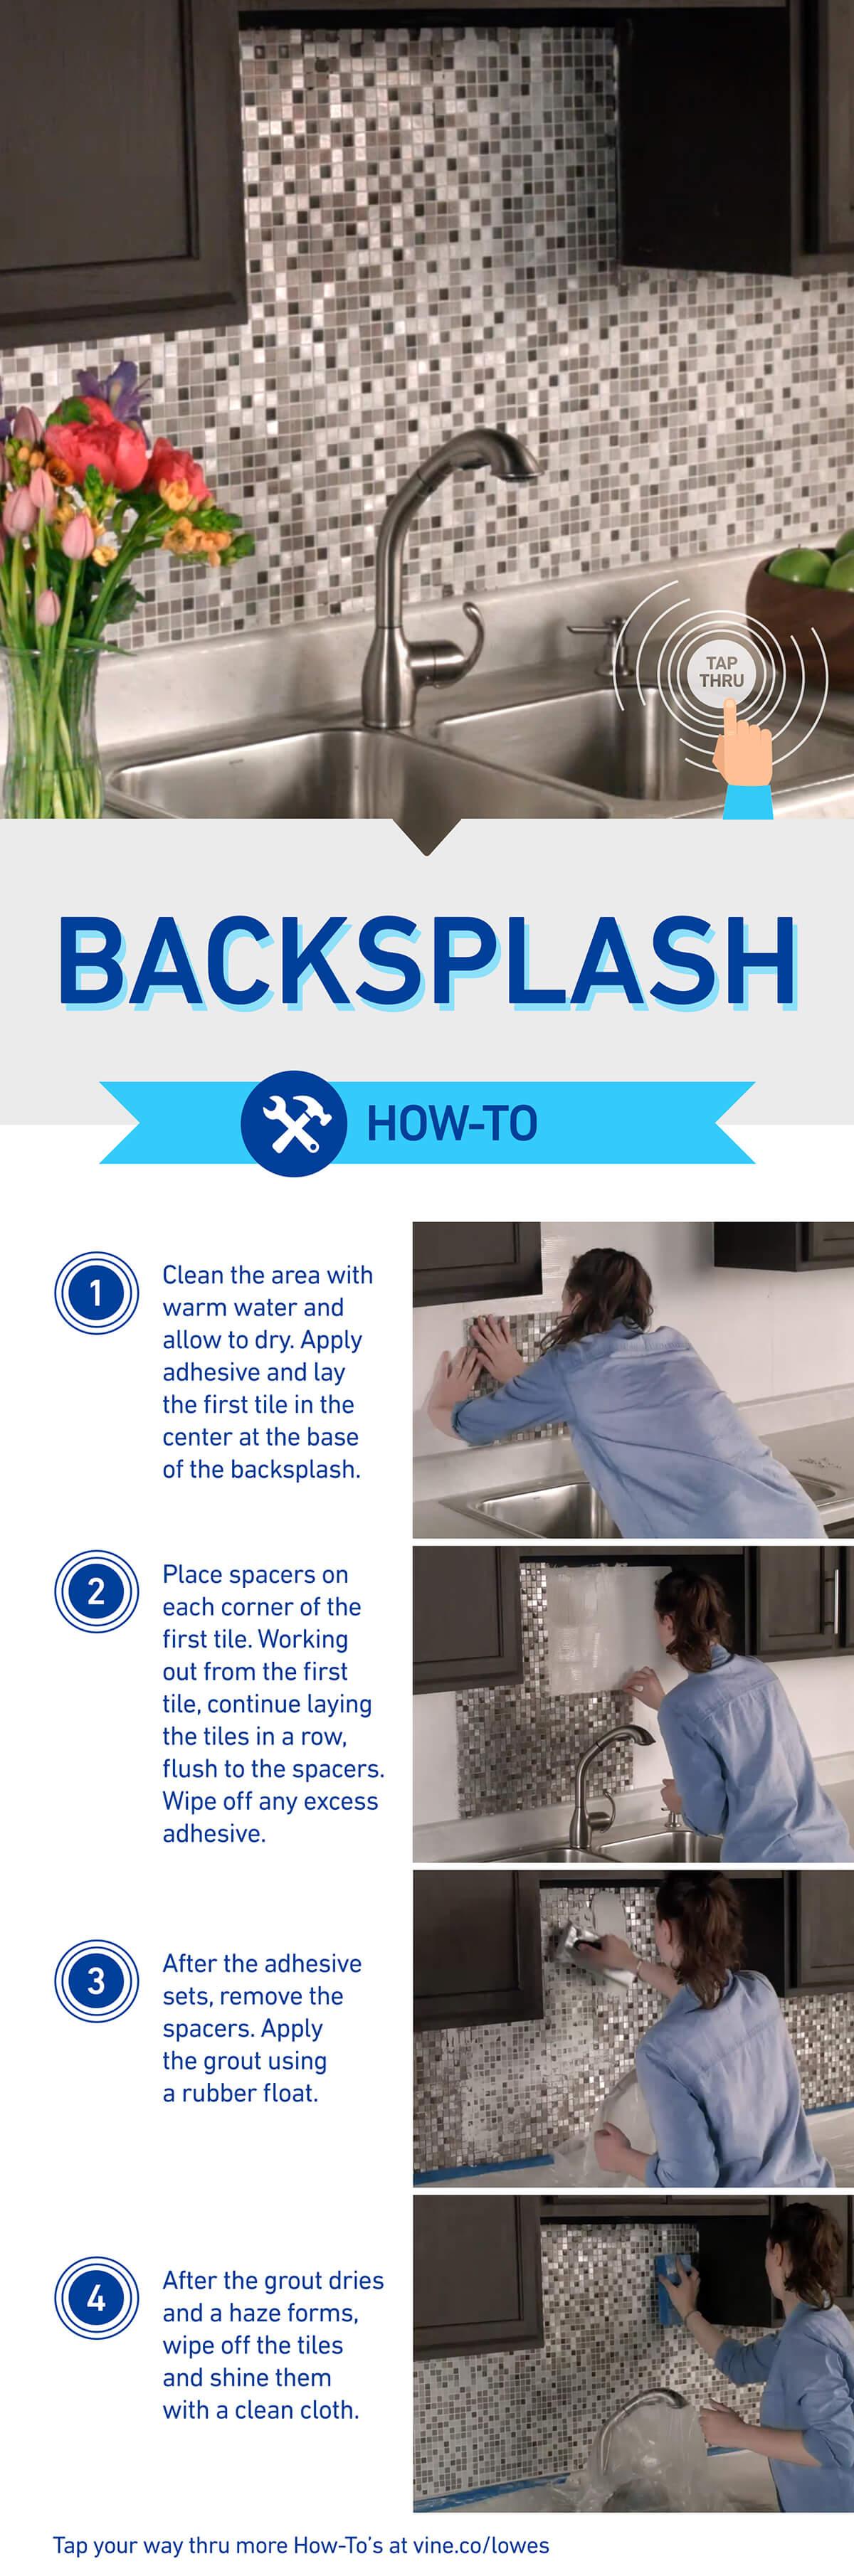 Adhesive Tile Segments make Backsplash Installation Easy